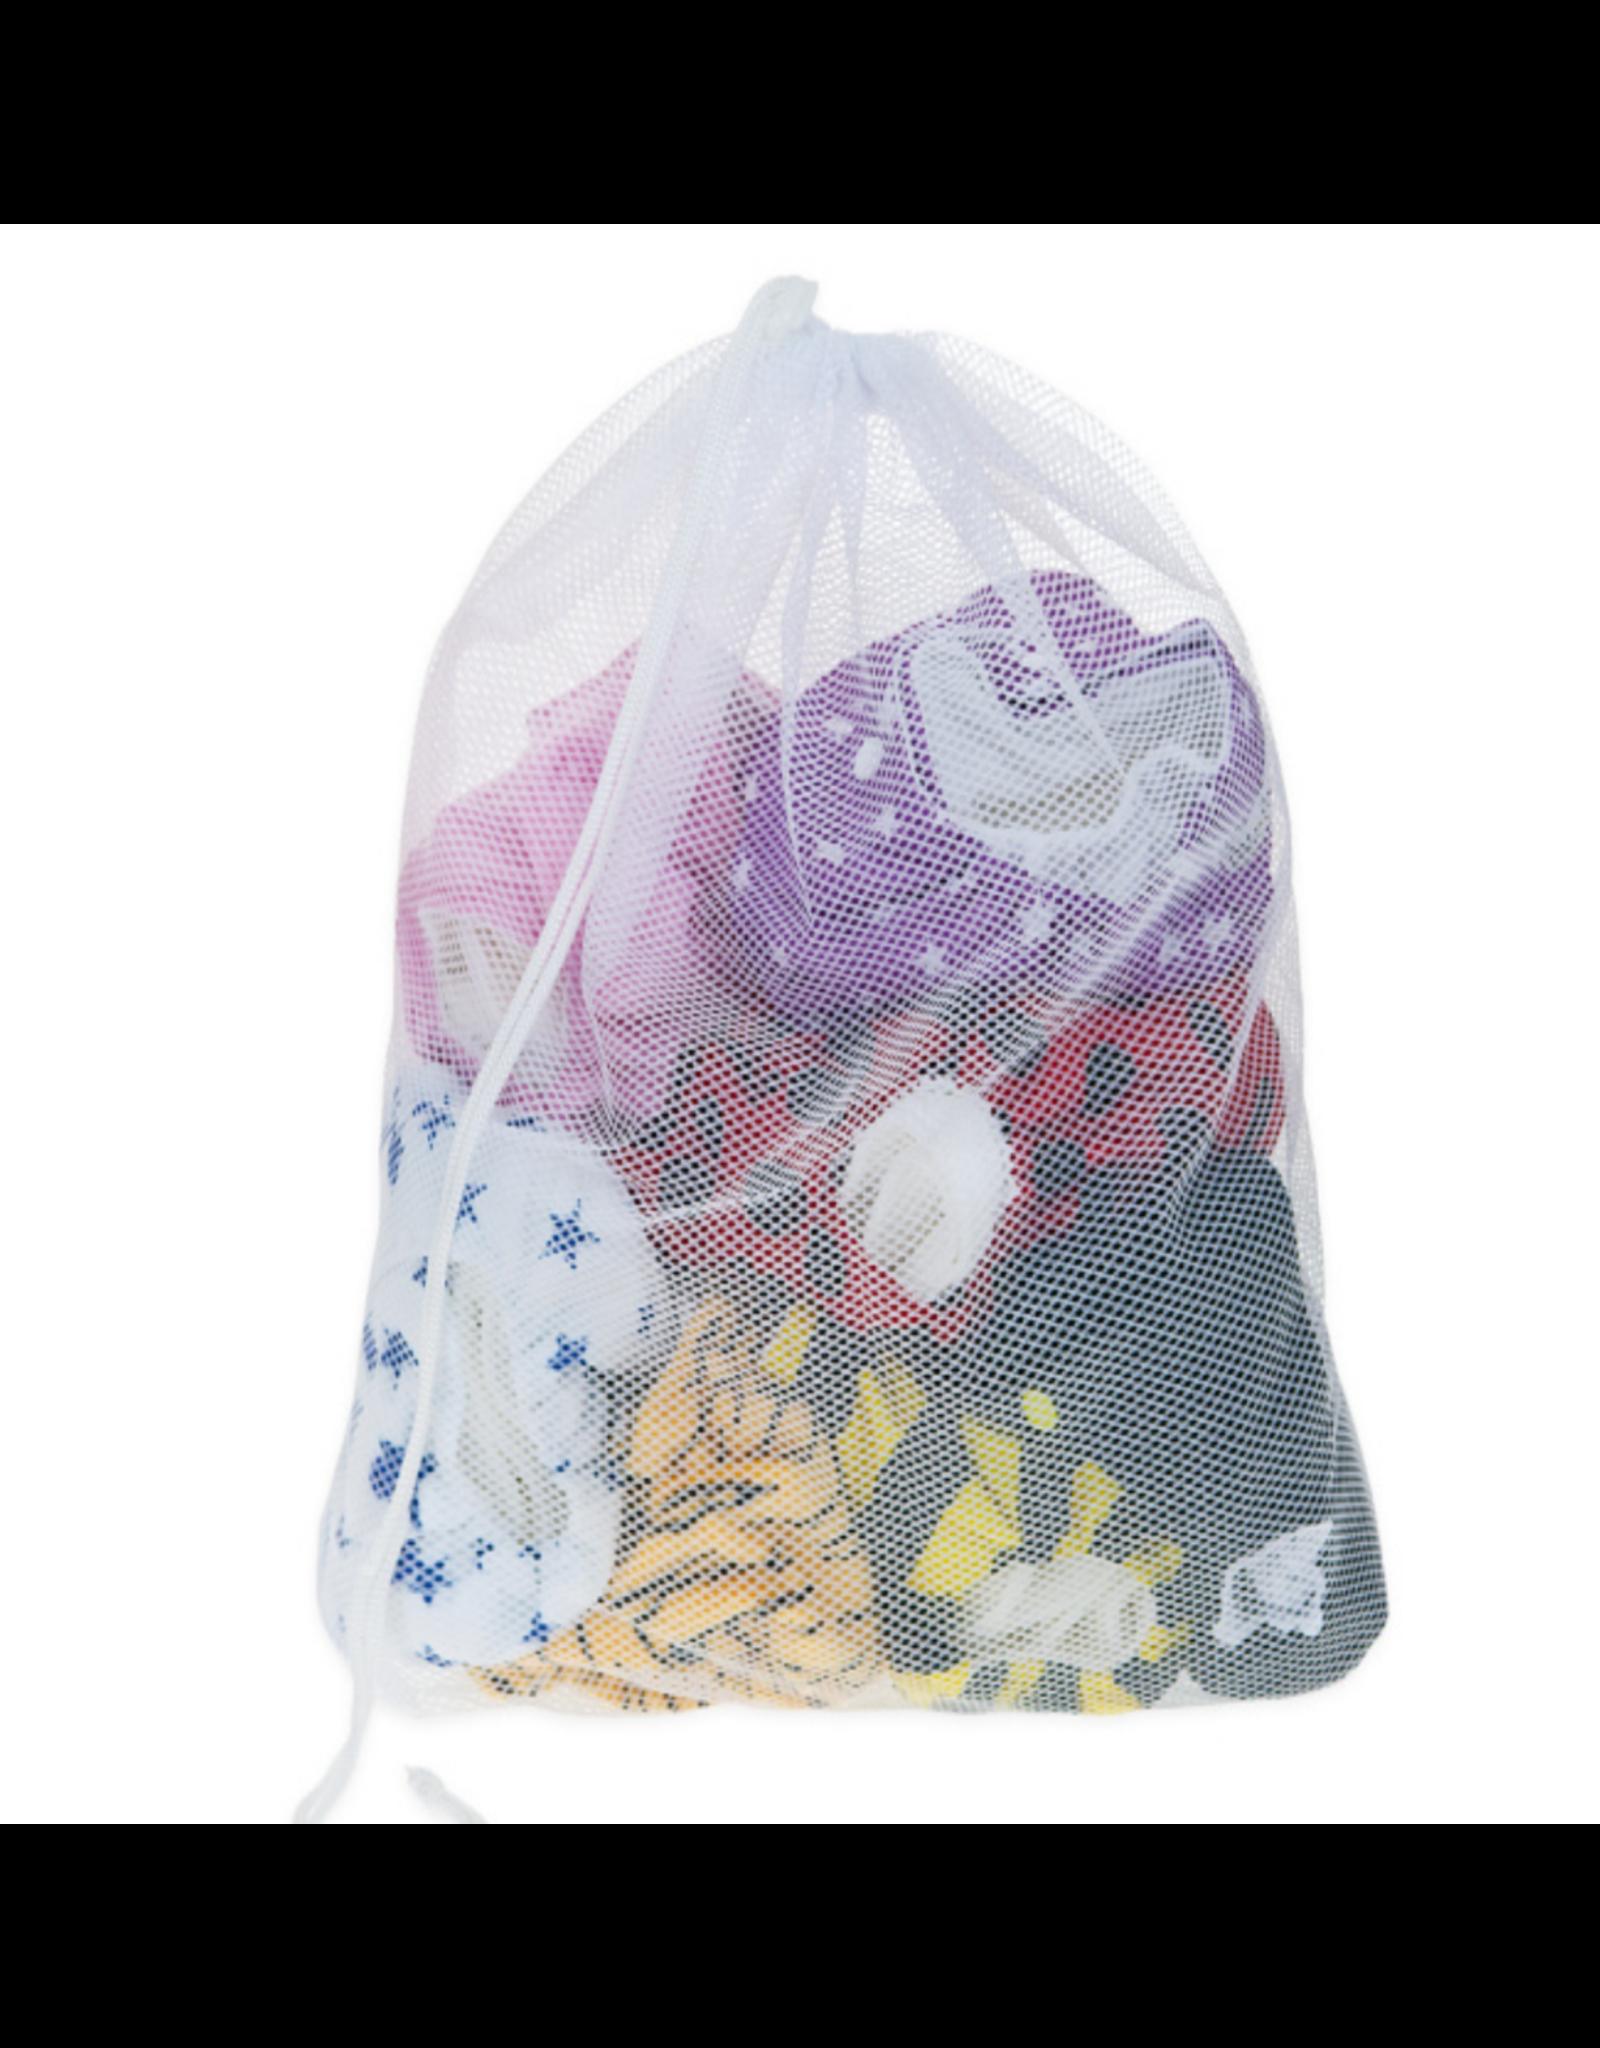 Baba & Boo Mesh Laundry Bags